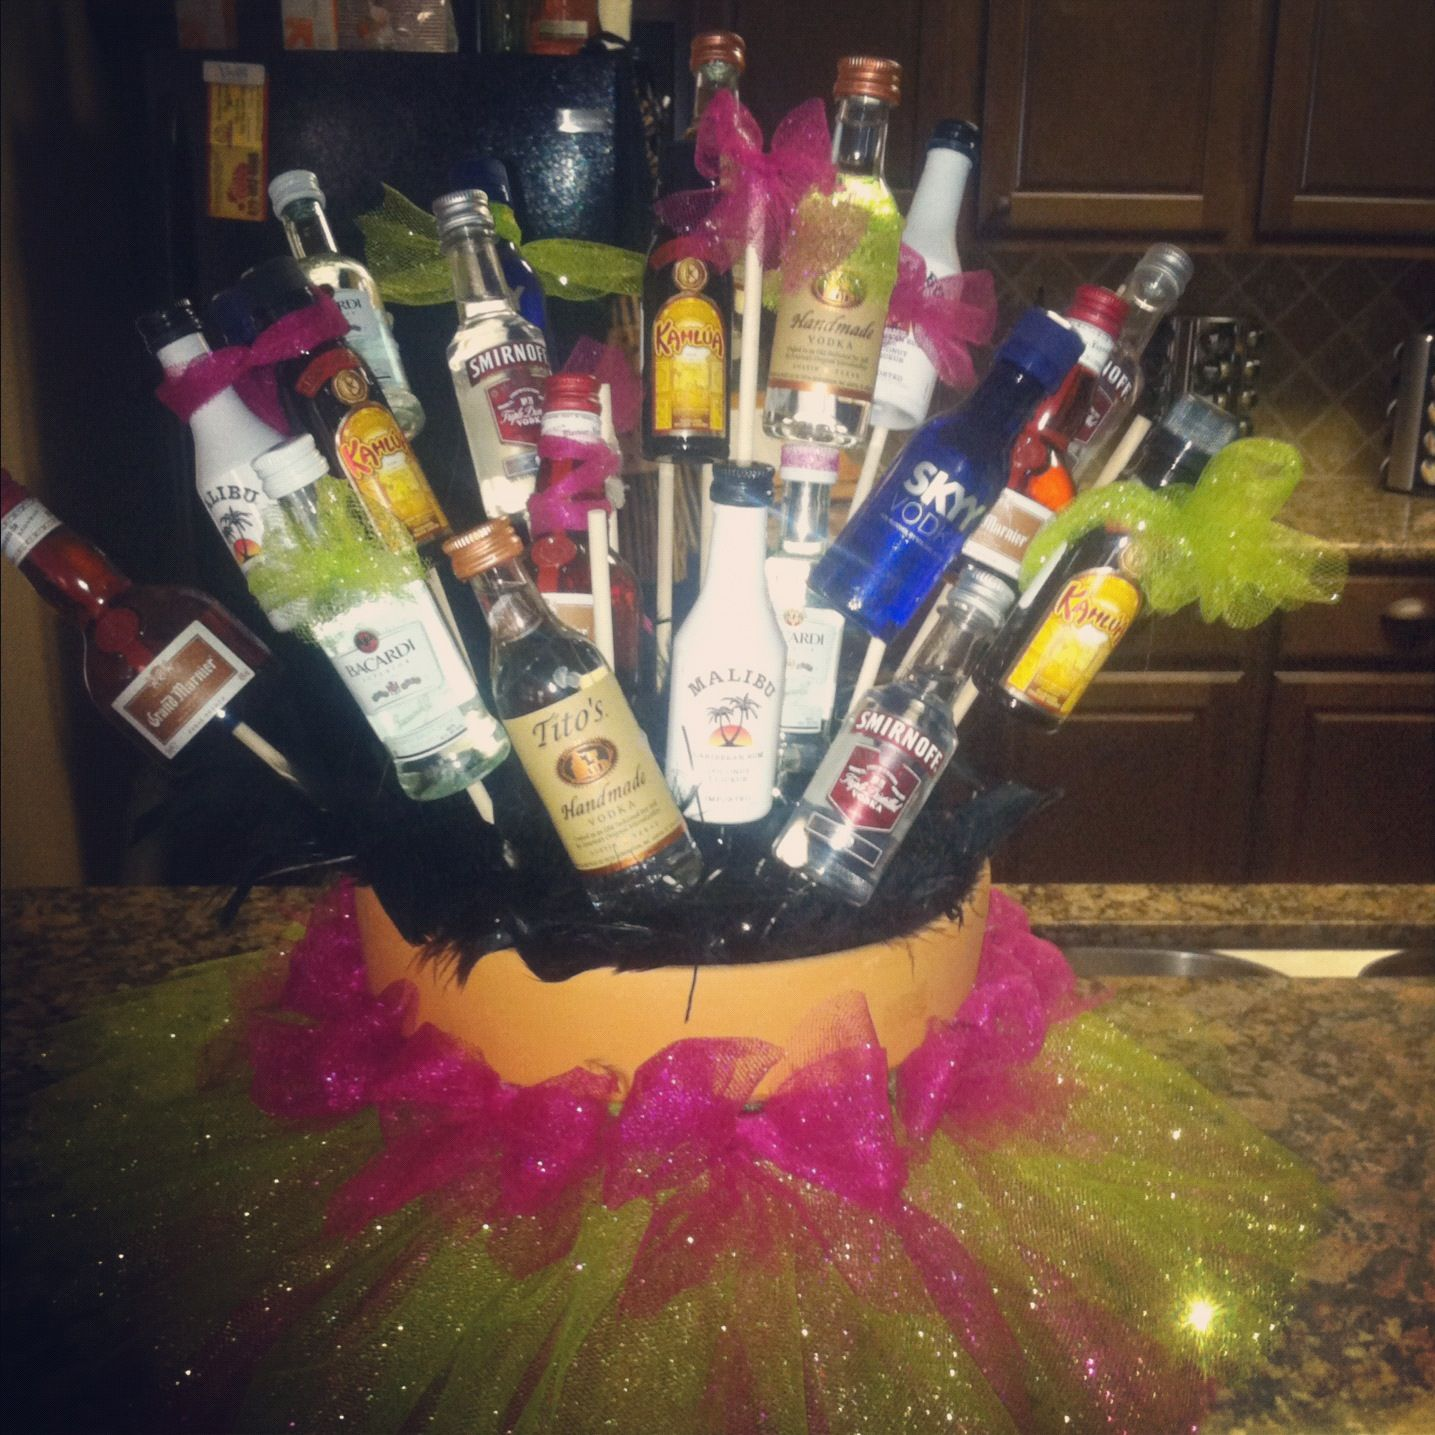 21st Birthday Gift Basket Alcohol : Madison s st birthday present alcohol basket drinks